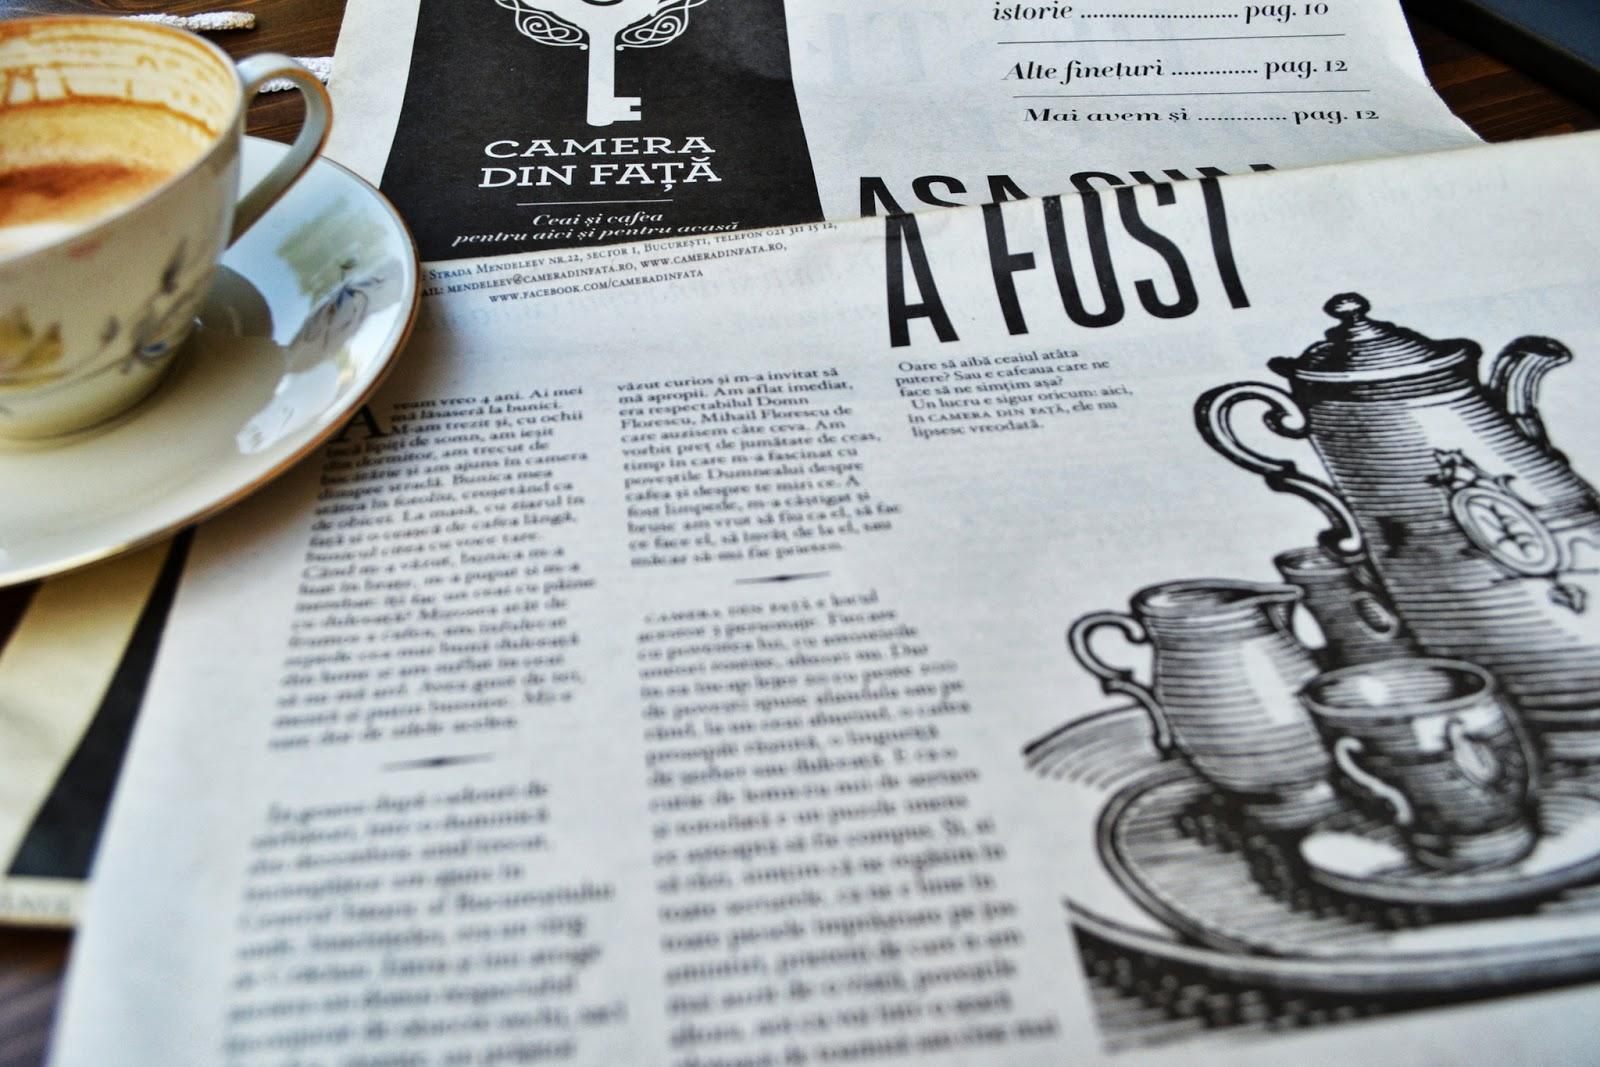 cappuccino, camera din fata, unde sa-mi beau cafeaua, blog, wheretohavecoffee